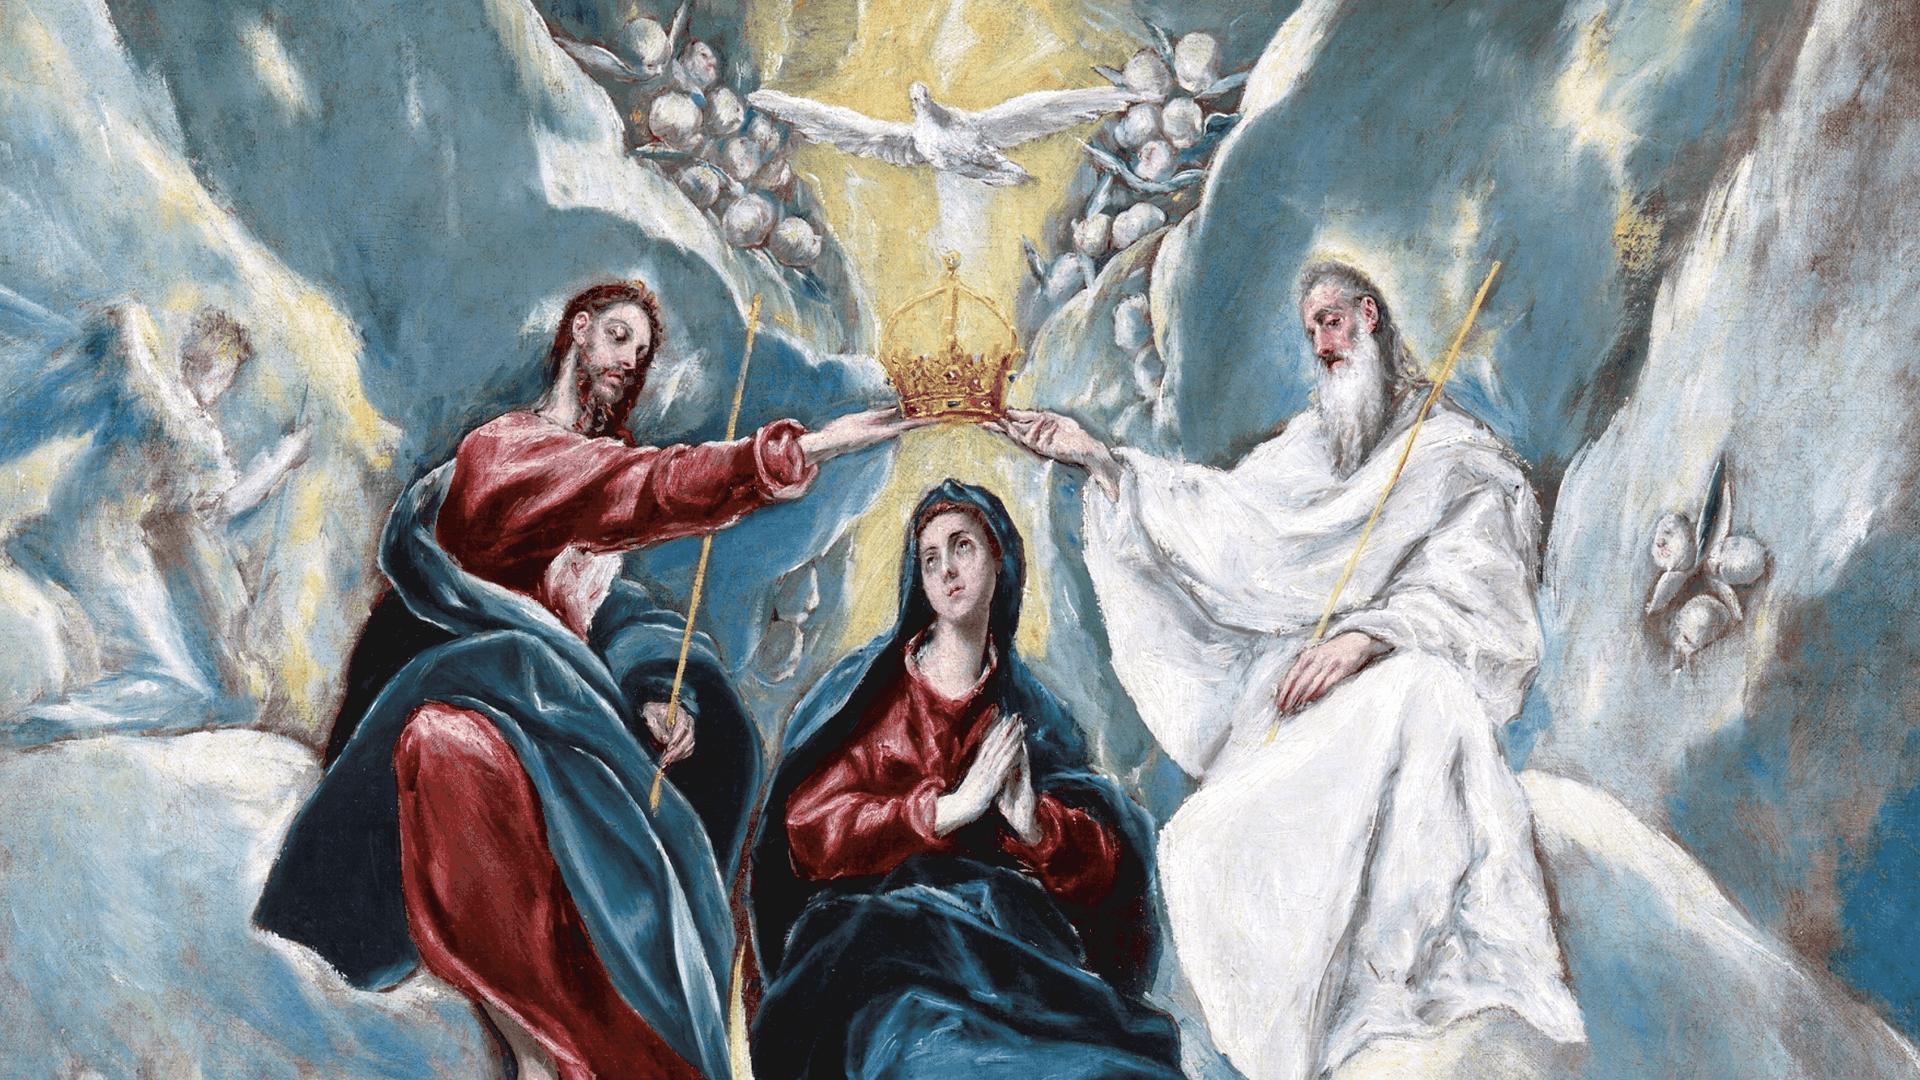 kroning-van-maria-koningin-el-greco-olv-ter-nood-heiloo